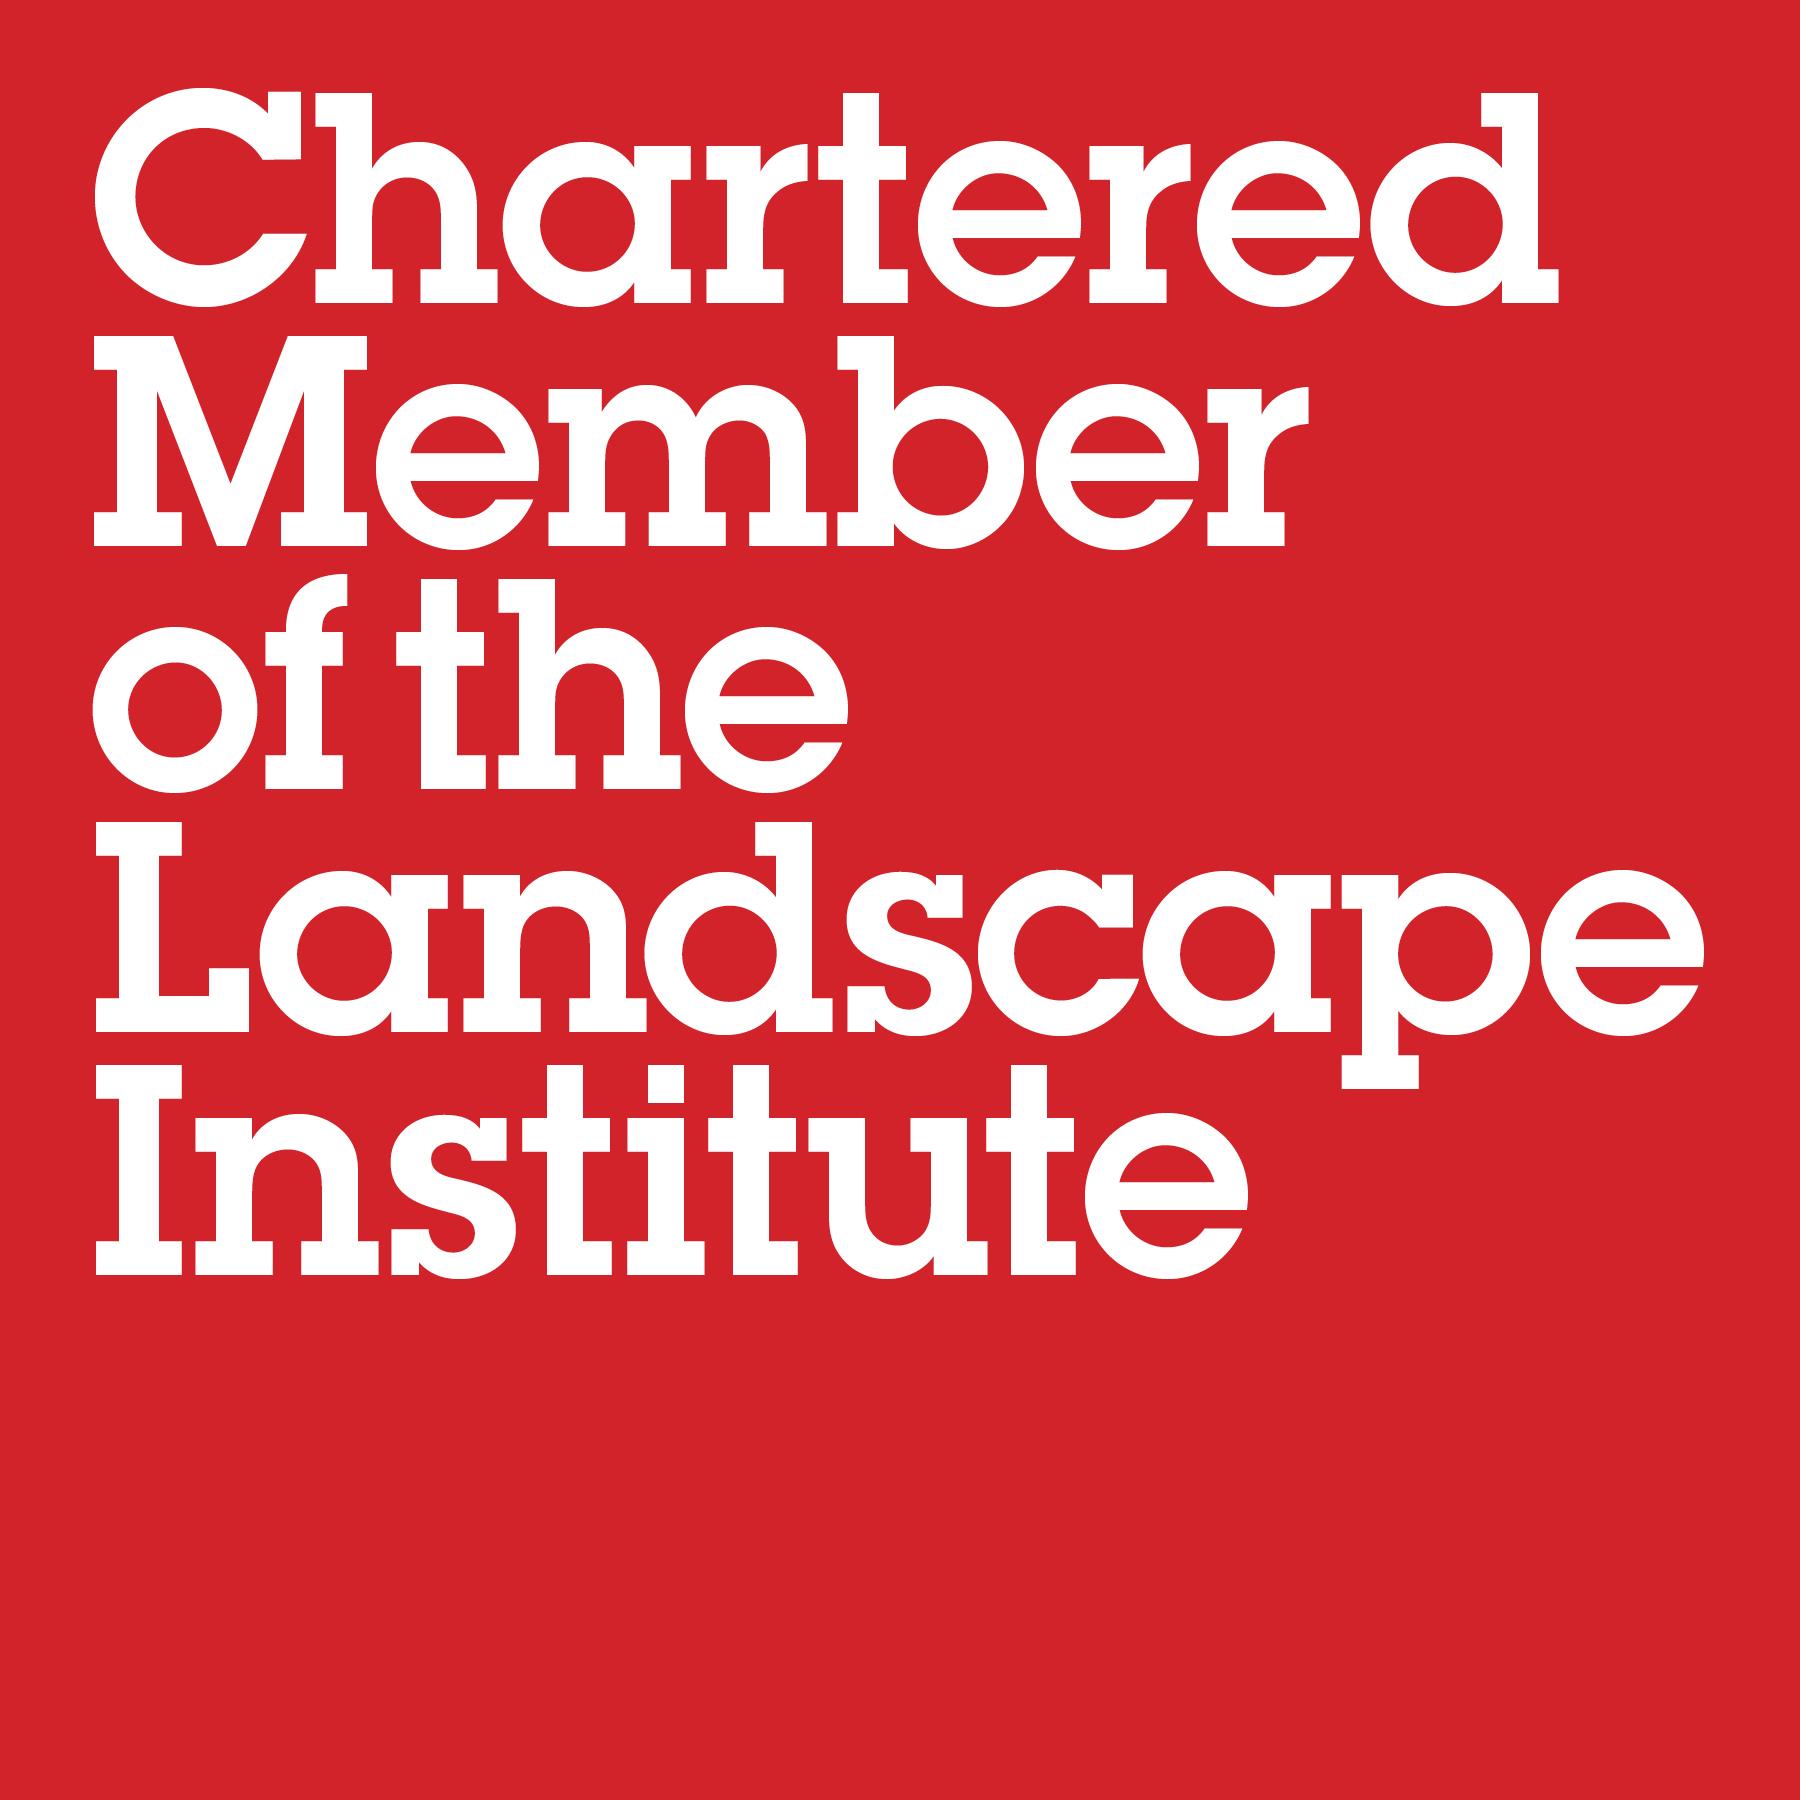 LI-Members-Logos-Chartered1.jpg